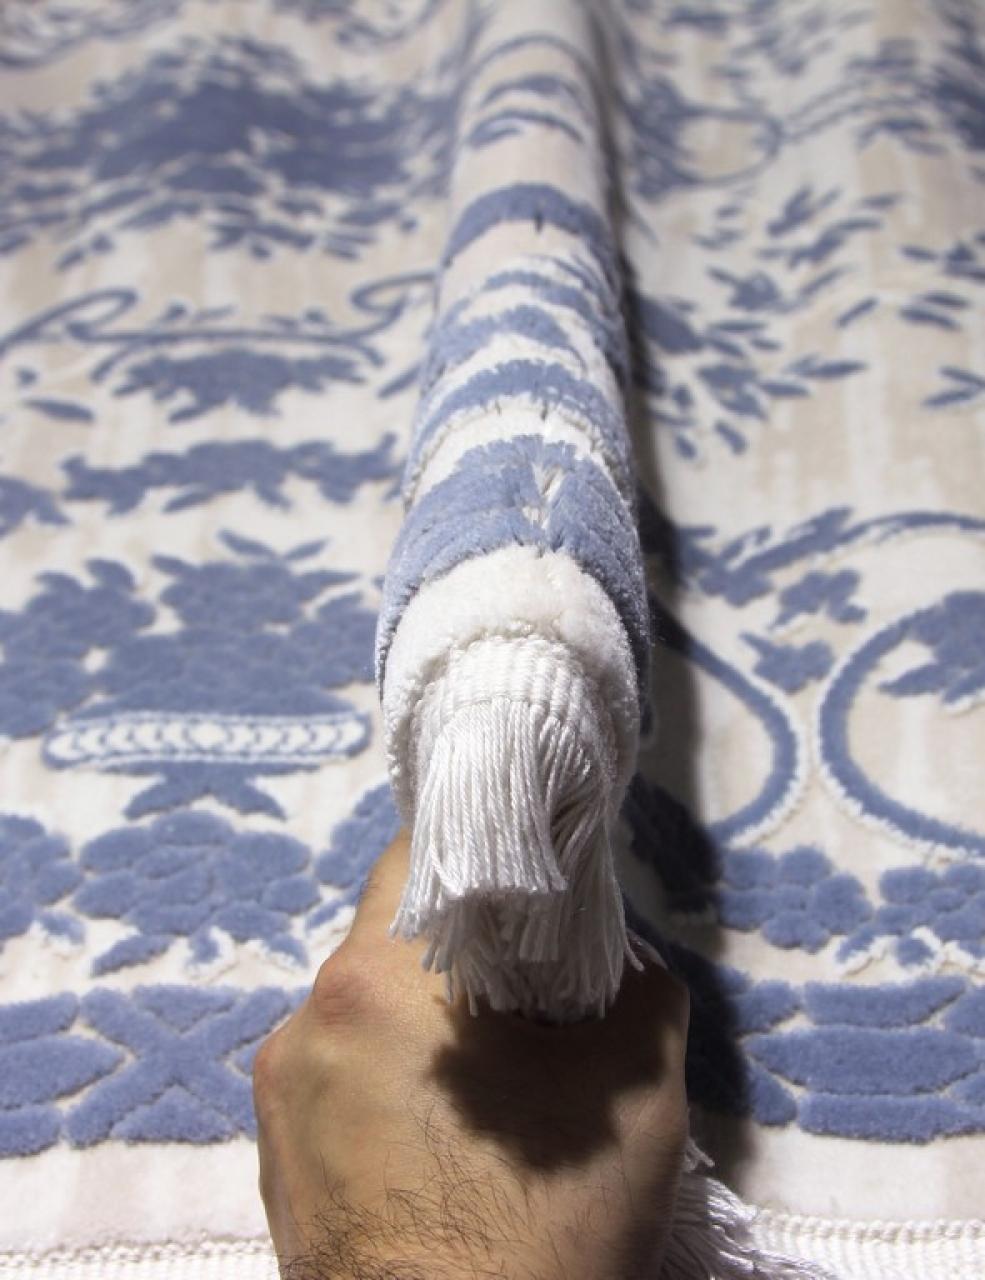 Ковер 08330T - BLUE / BLUE - Овал - коллекция TRUVA - фото 2